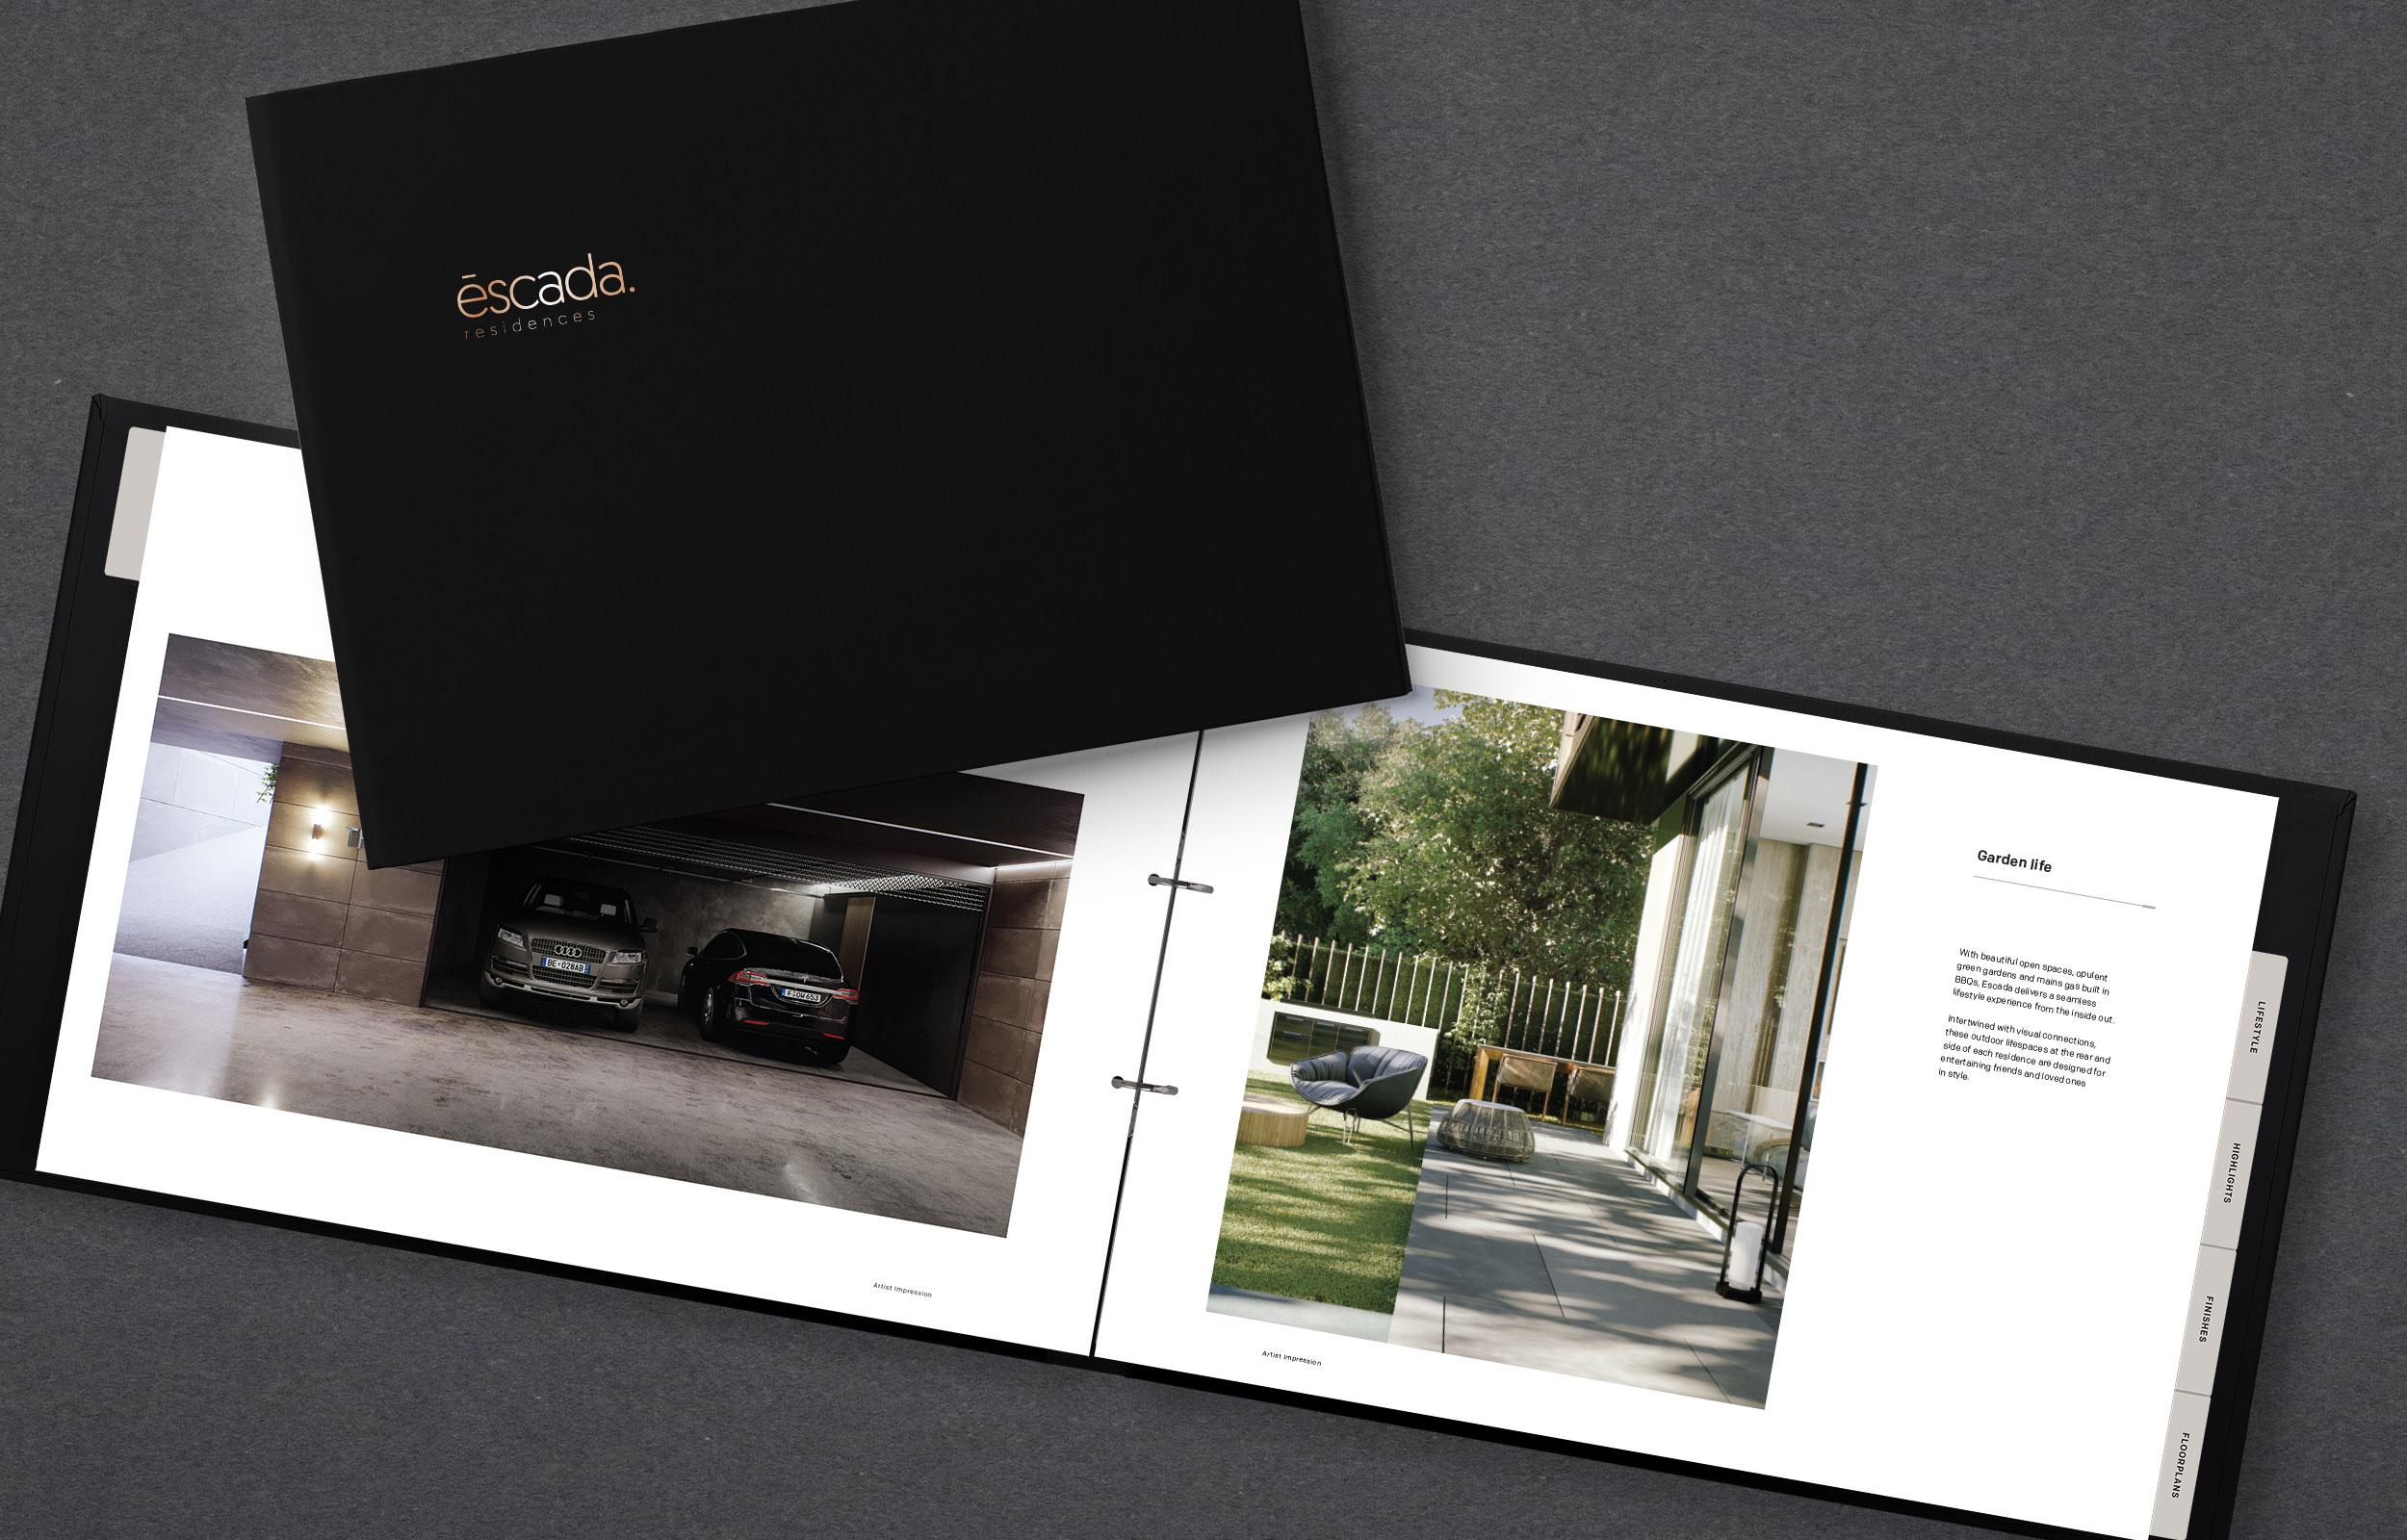 enoki-graphic-escada-7.jpg